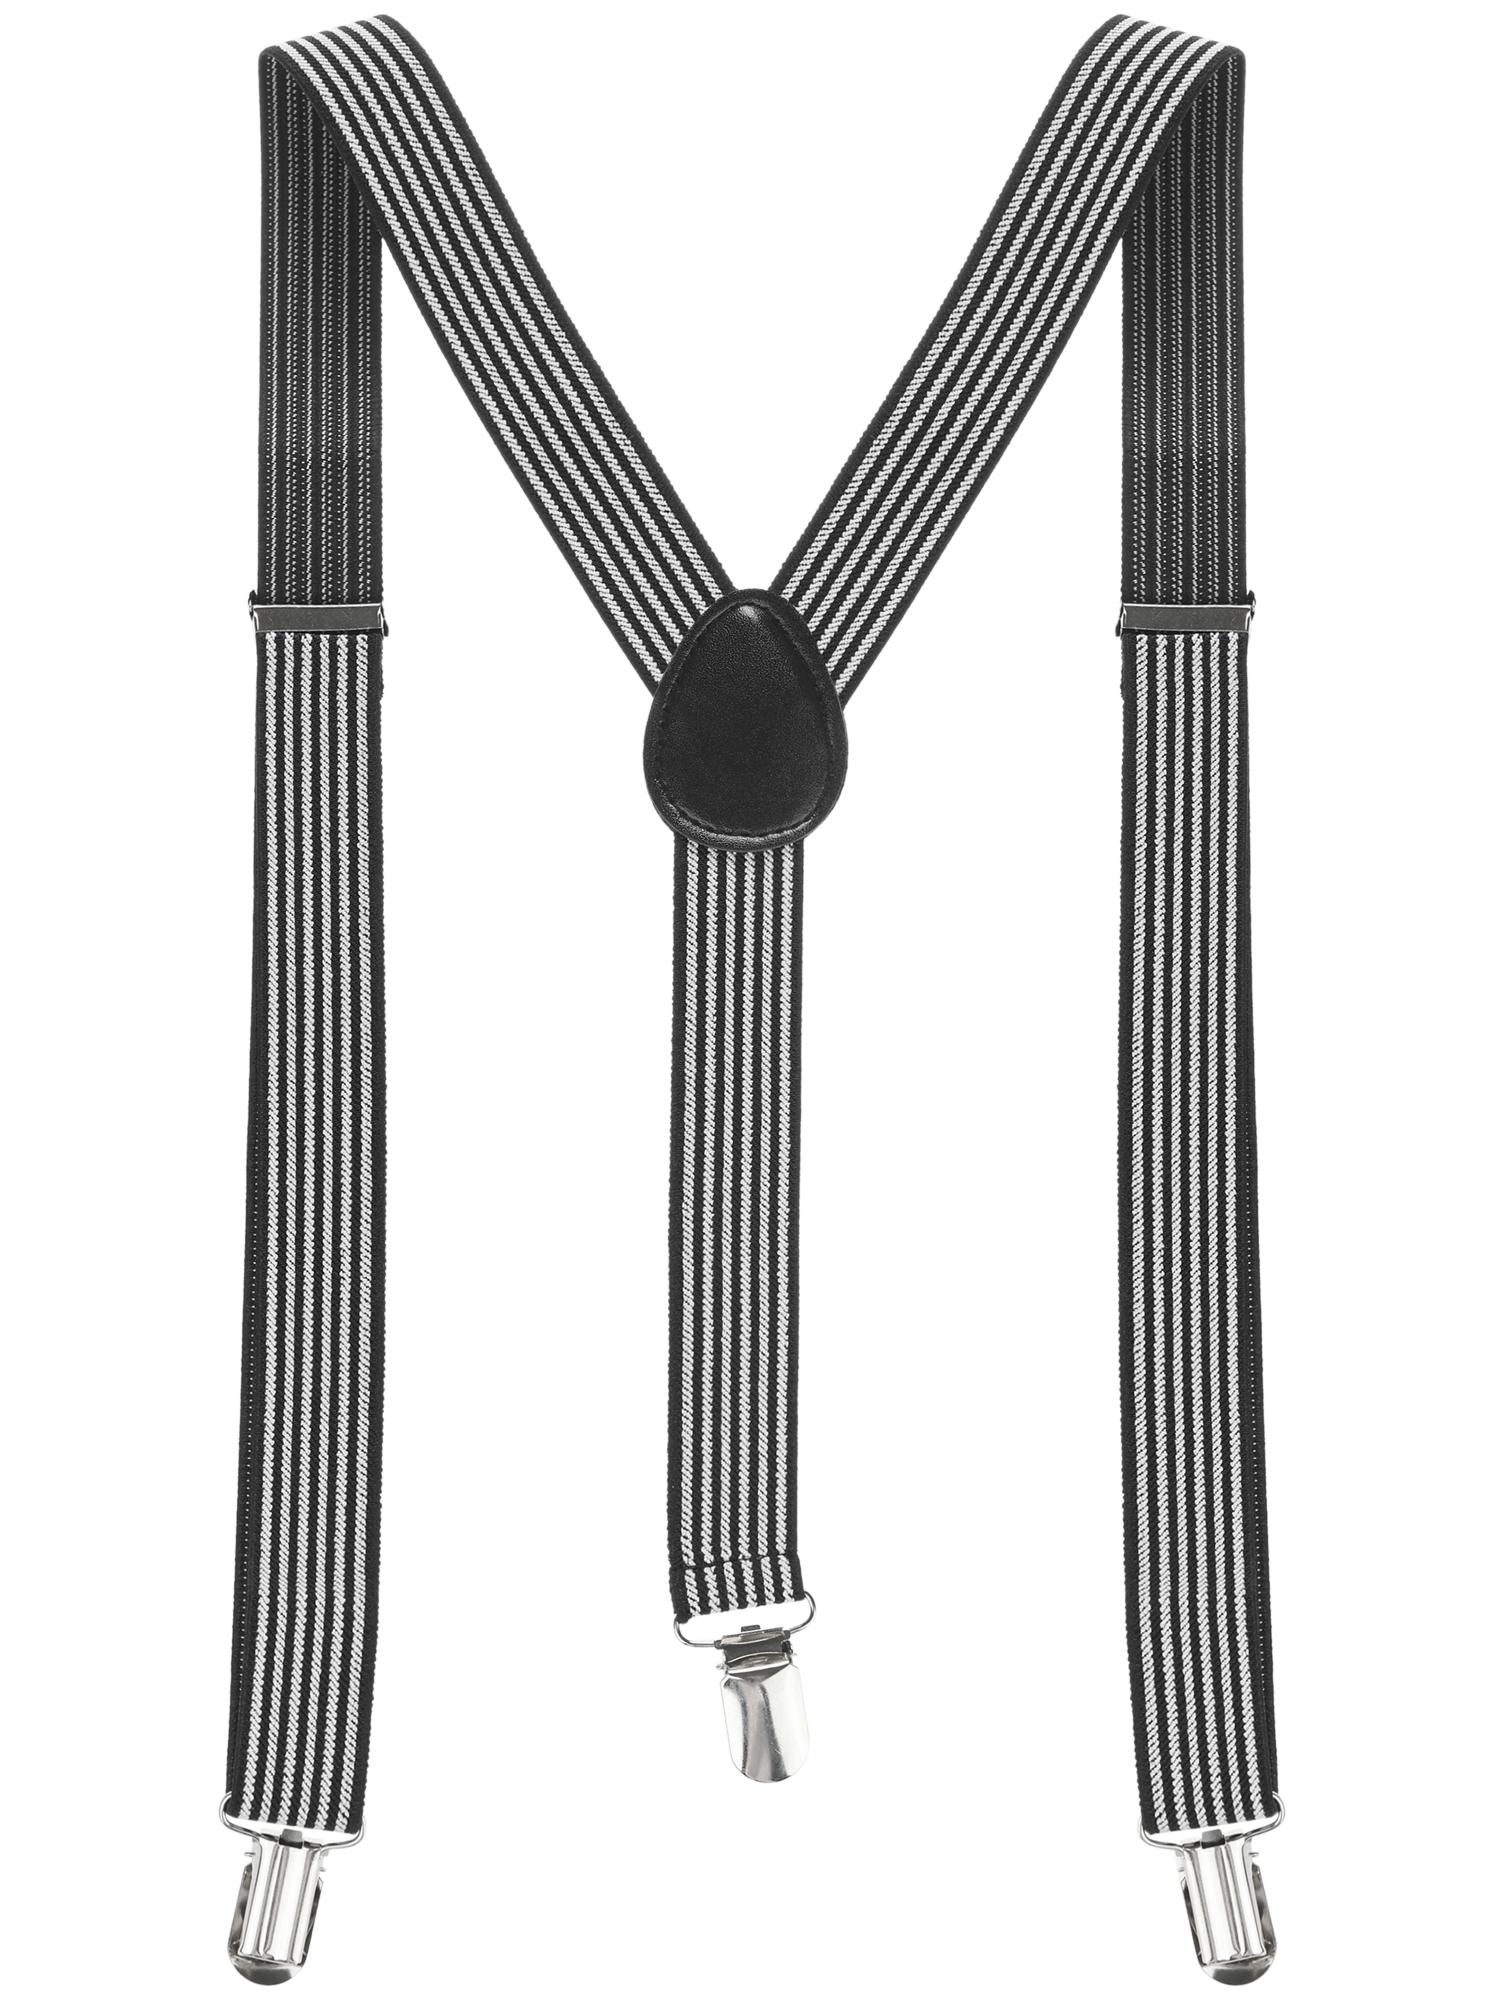 Unisex Stripes Pattern Clip On Y Shape Suspenders Black